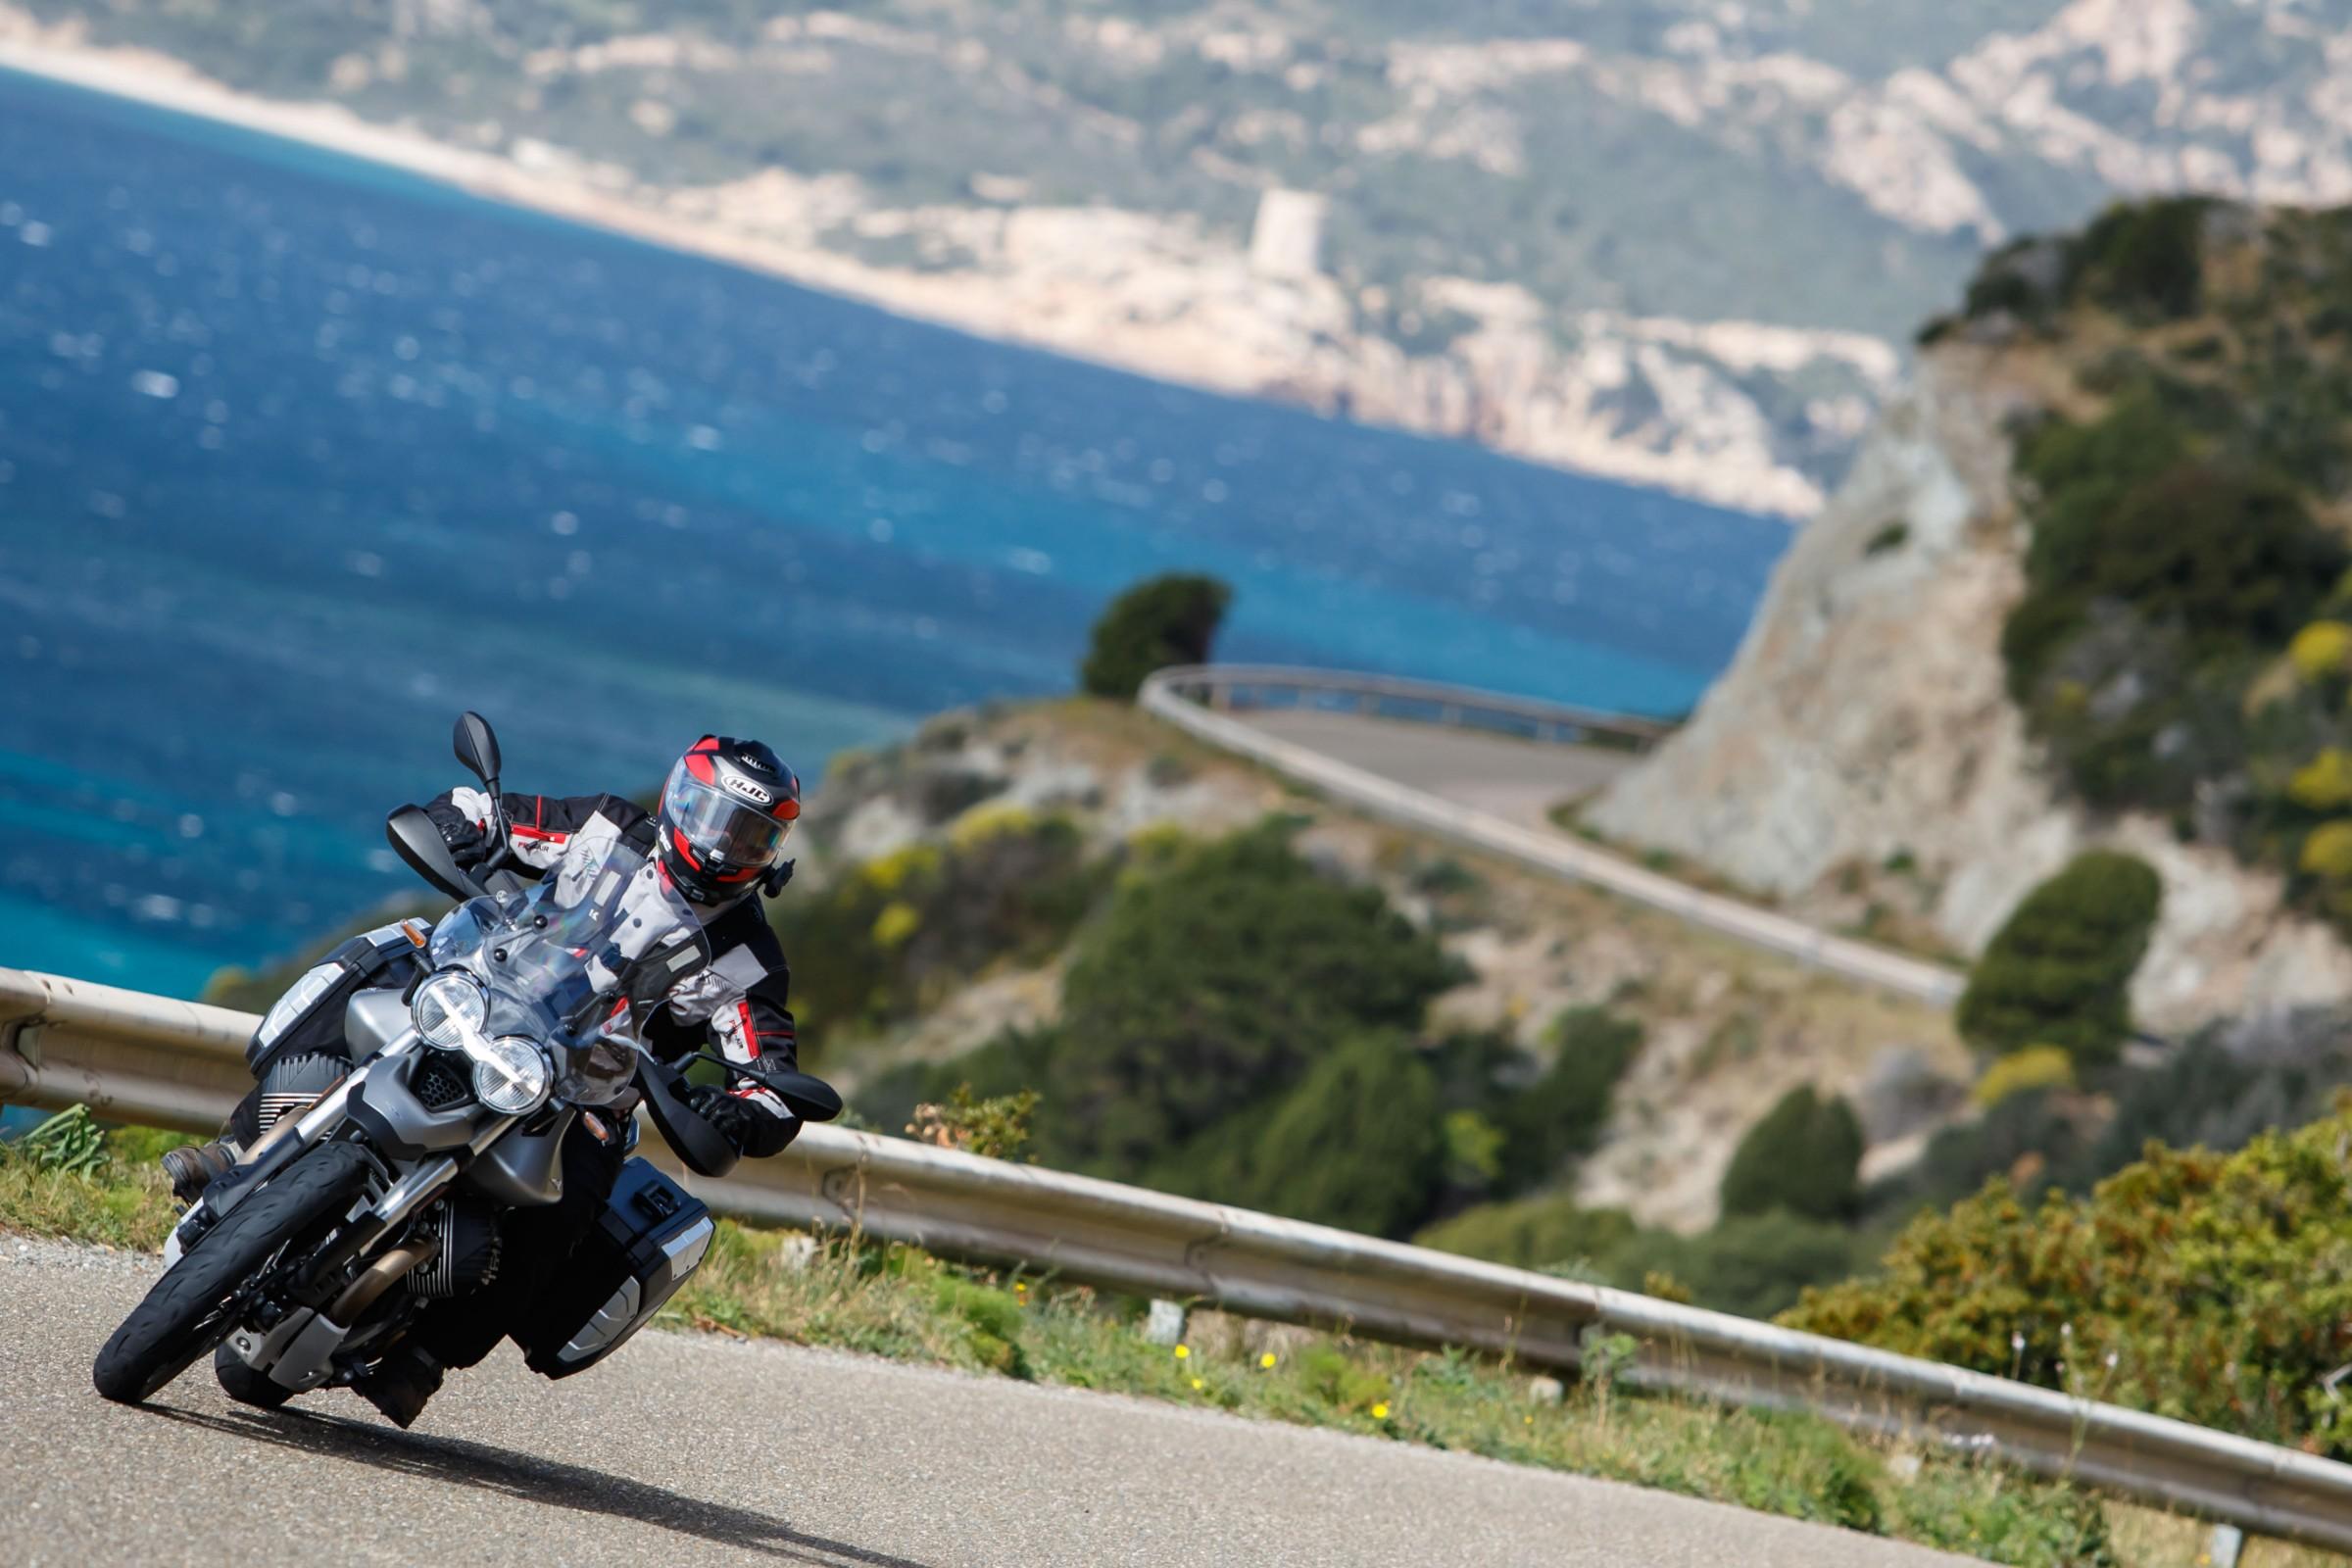 d2604b5bf380 2020 Moto Guzzi V85 TT first ride review - RevZilla